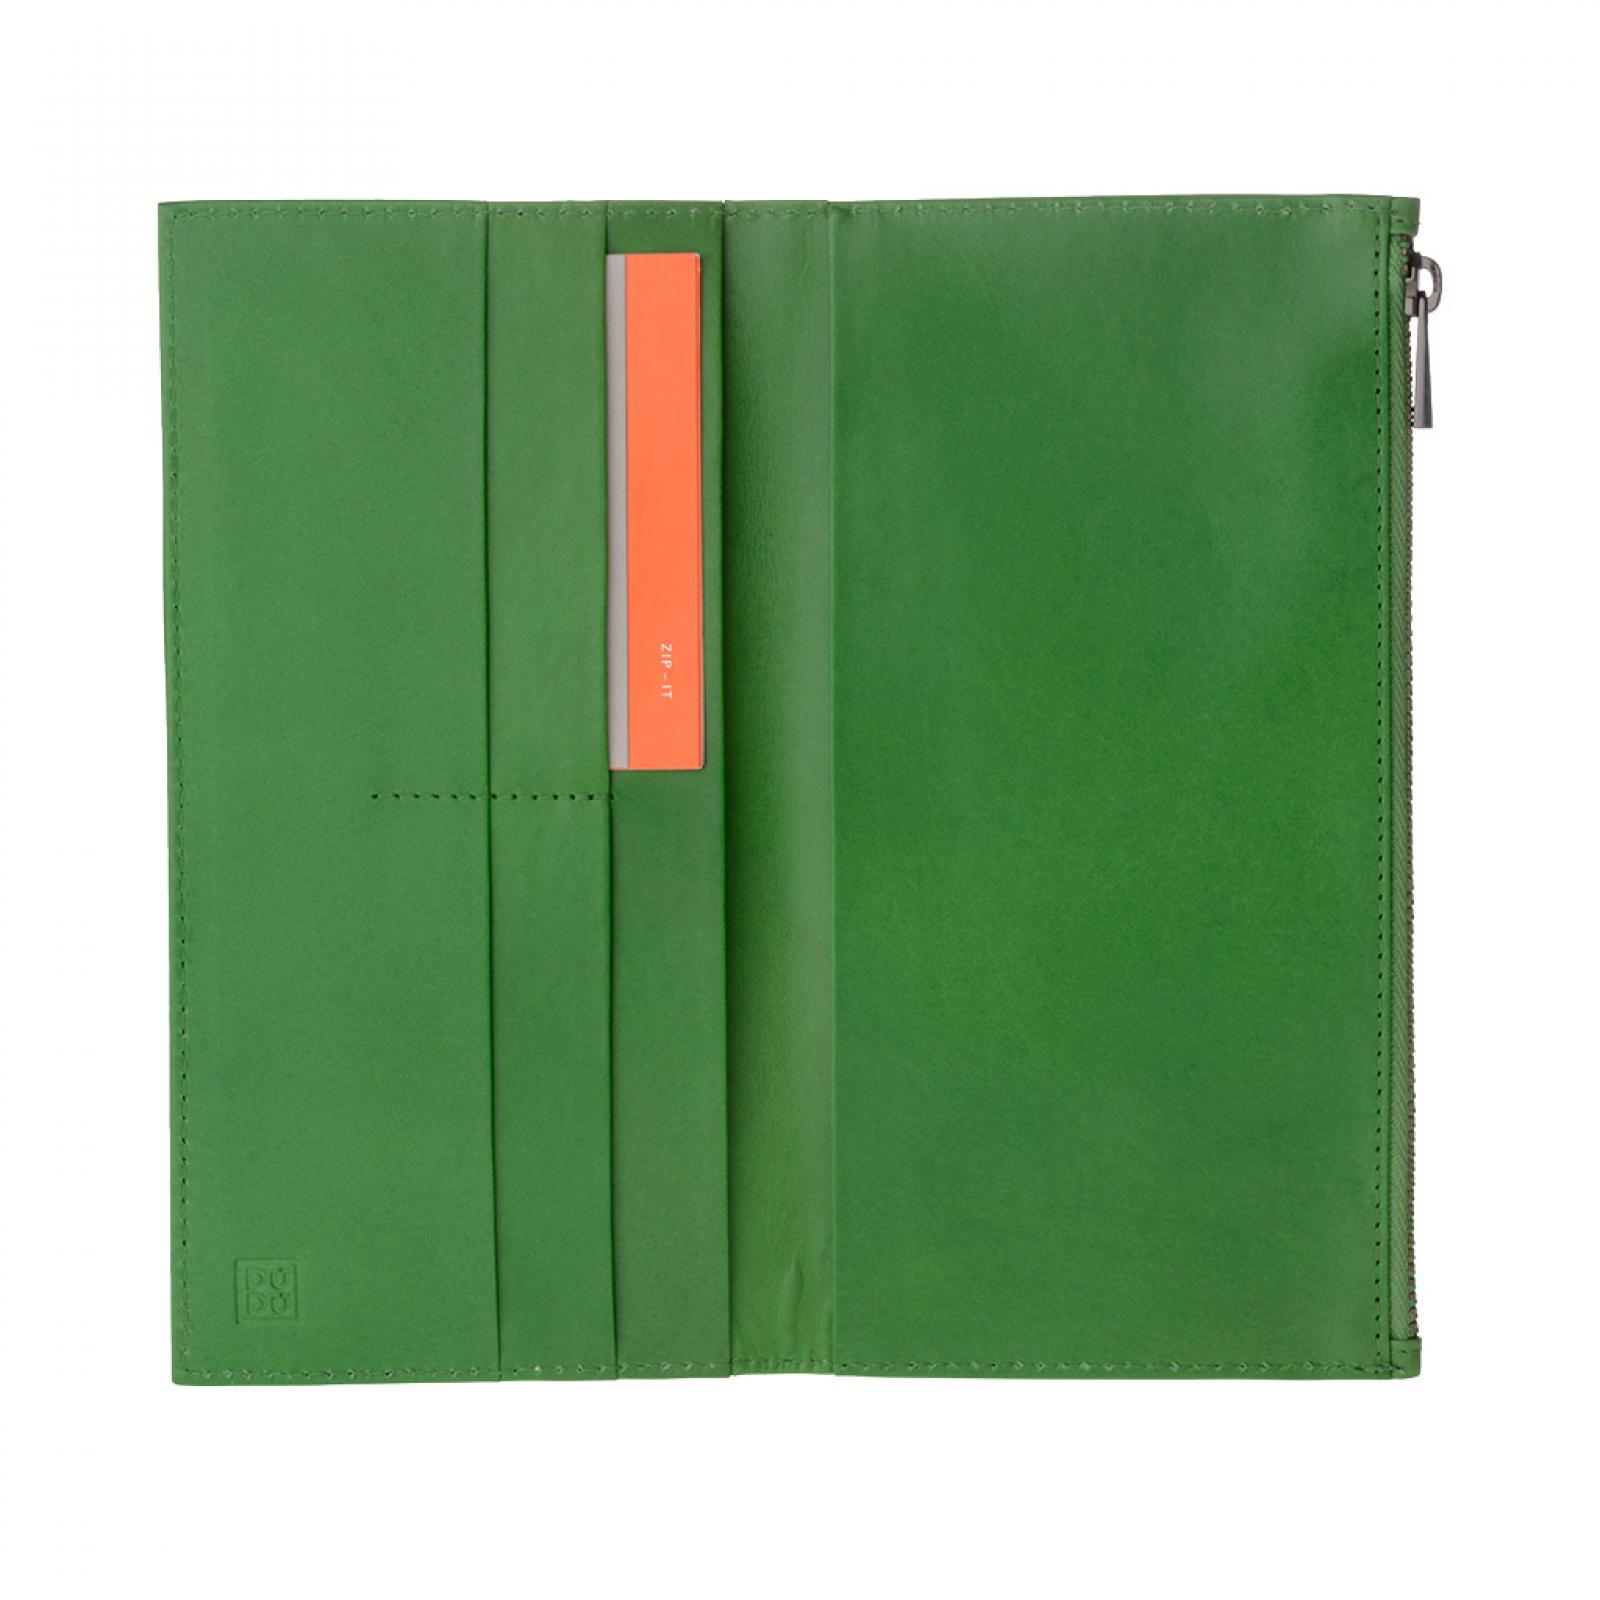 Portafogli  Uomo  Zip-it - Tom - Verde